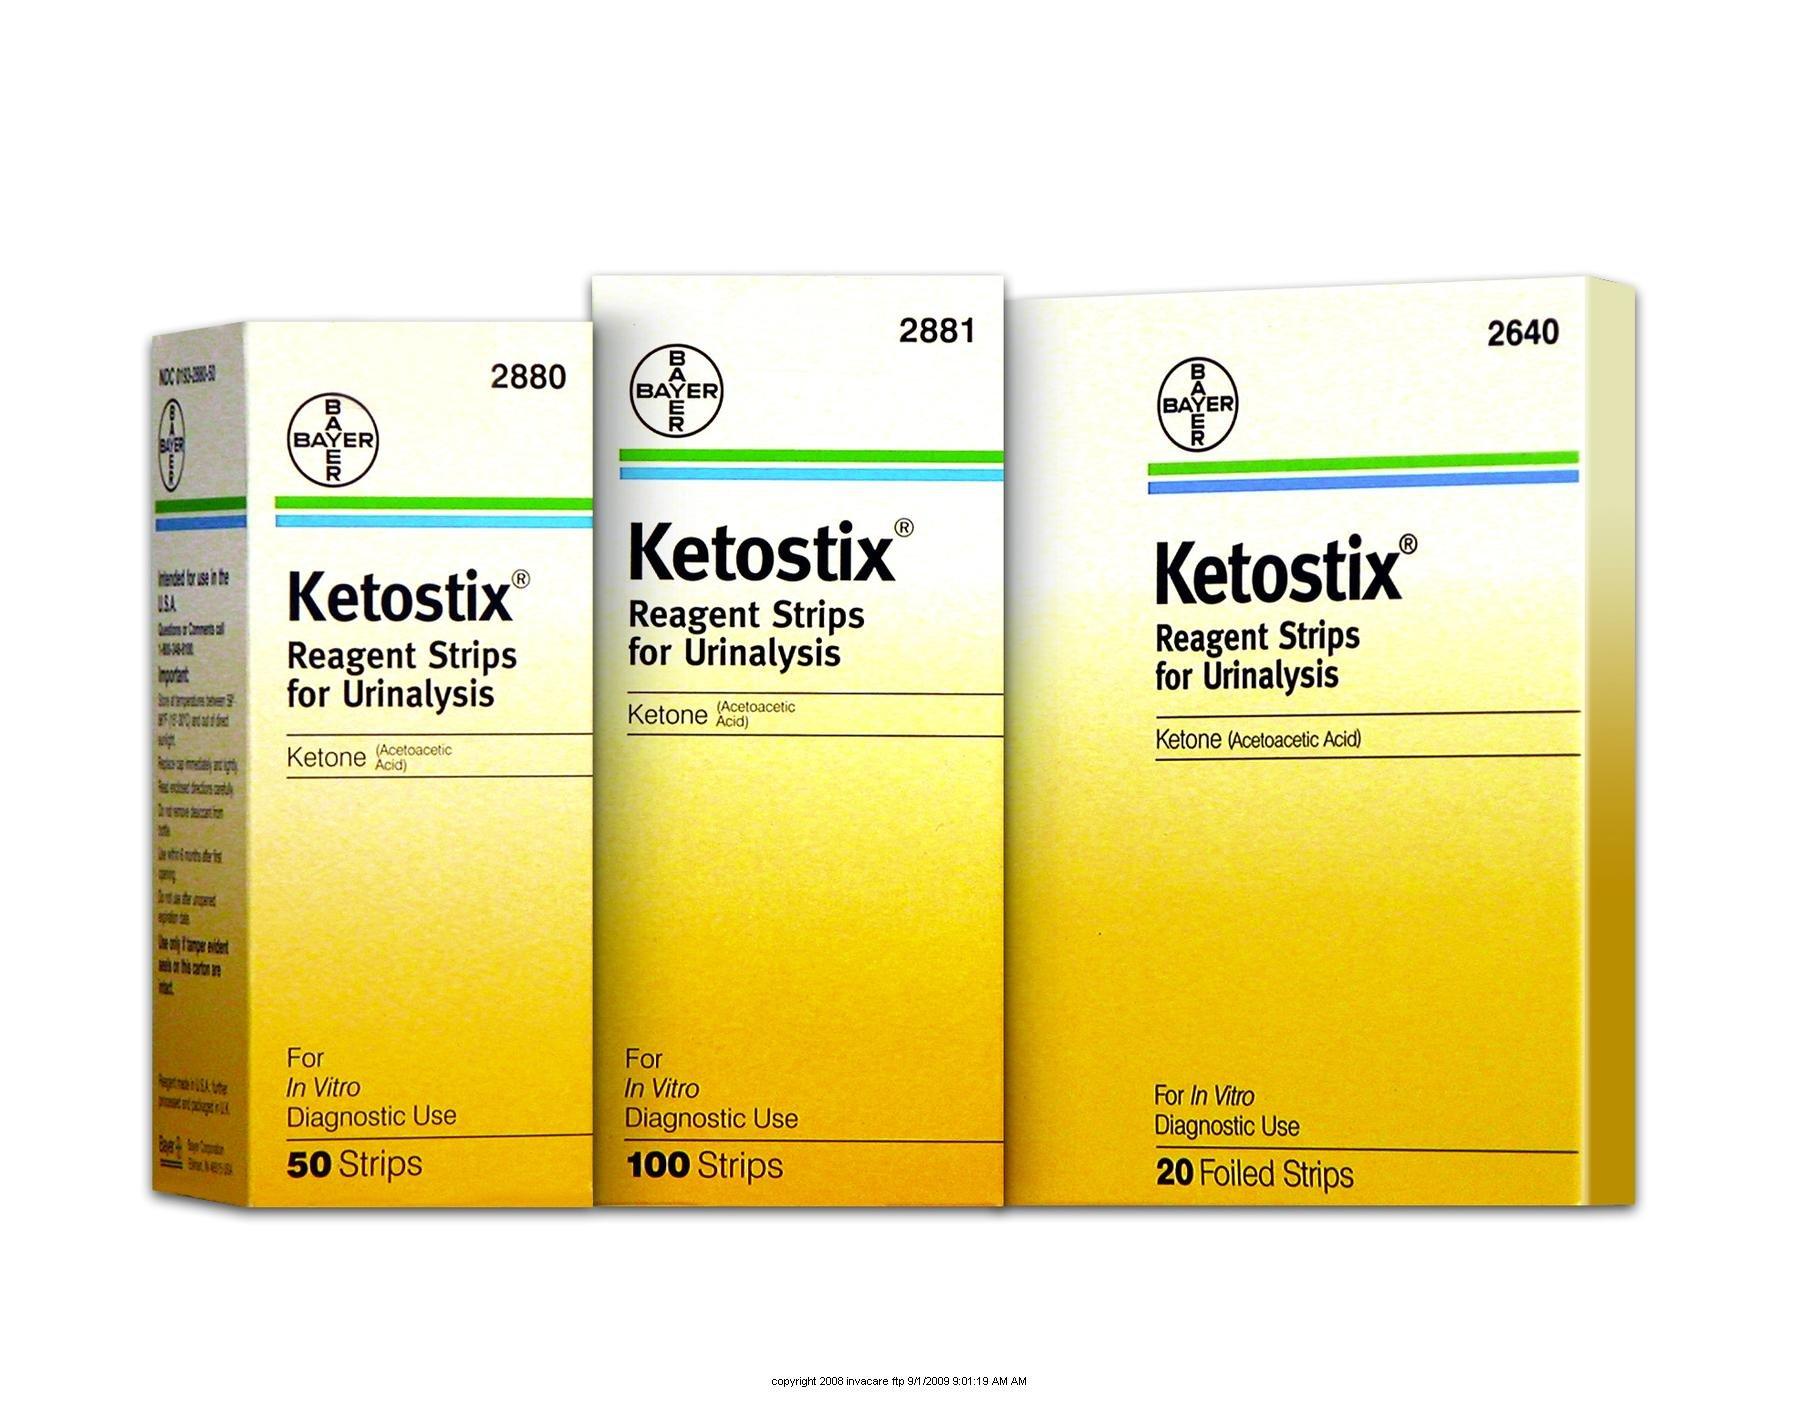 Bayer (Model#BA-2881) Ketostix Reagent Urine Test Strips - 1/Case of 1200 (100 Strips per Box, 12 Boxes per Case)